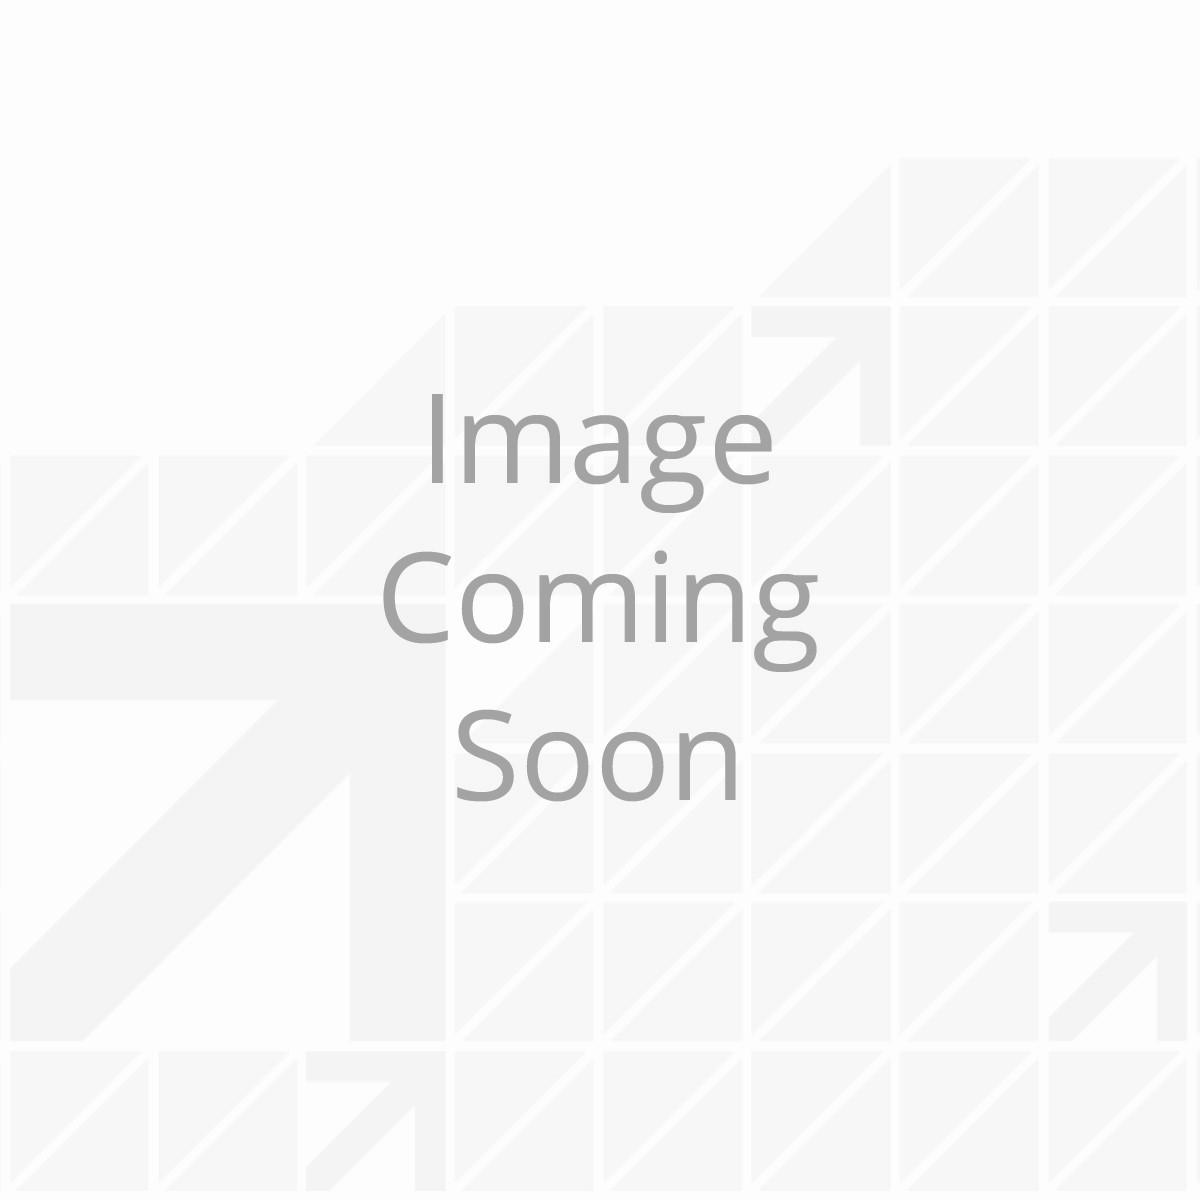 207576_Hex-Bolt_001